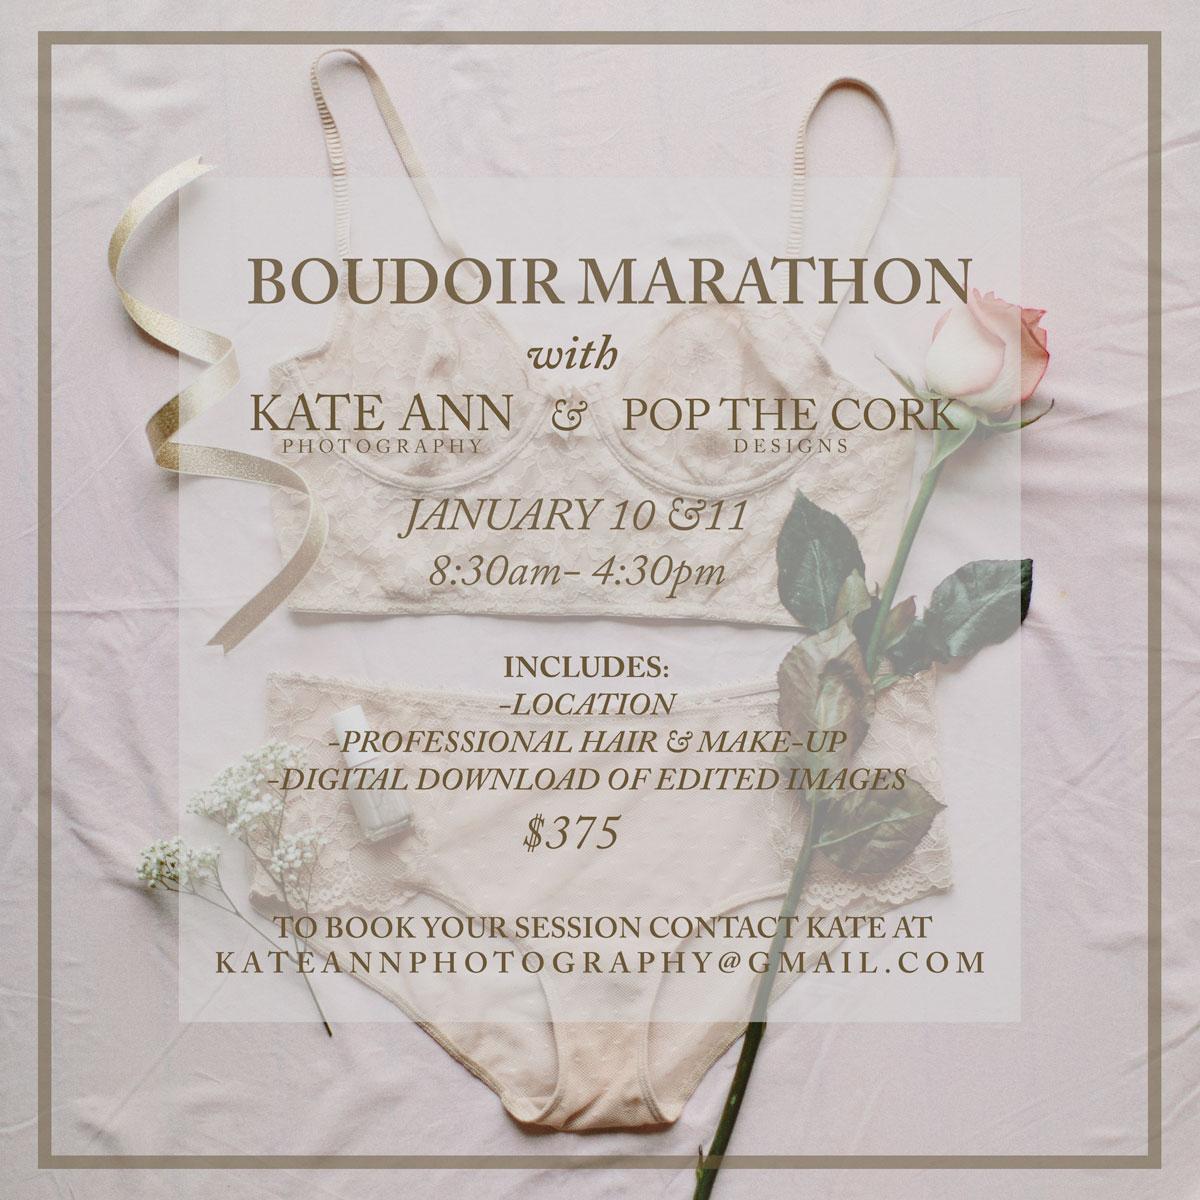 Boudoir-Marathon-Ad